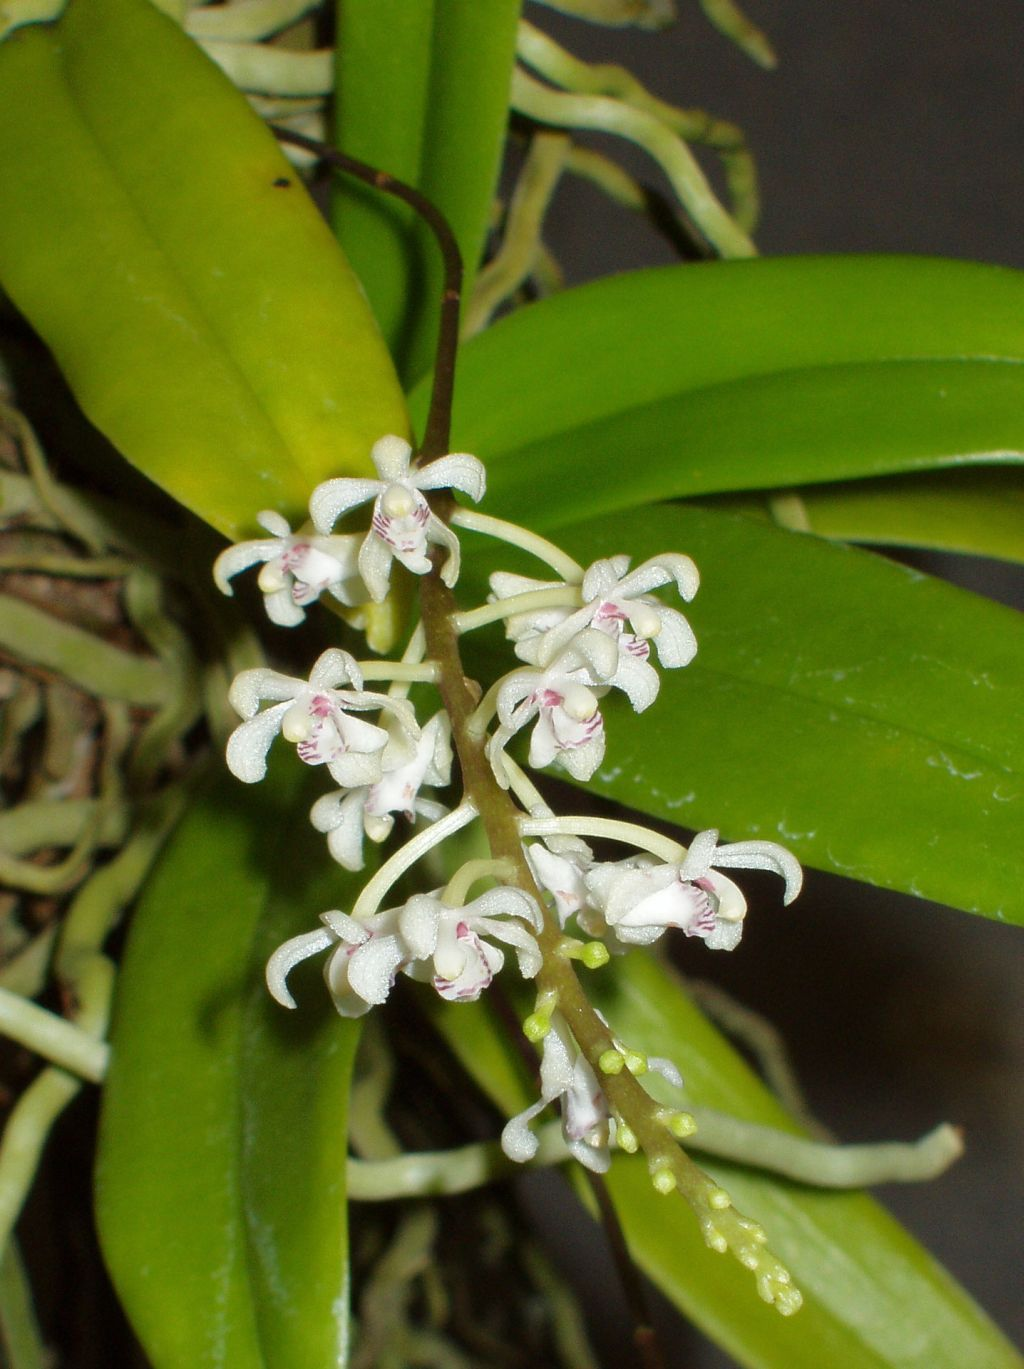 Brachypeza Archytas Orchid Flower Miniature Orchids Orchid Images